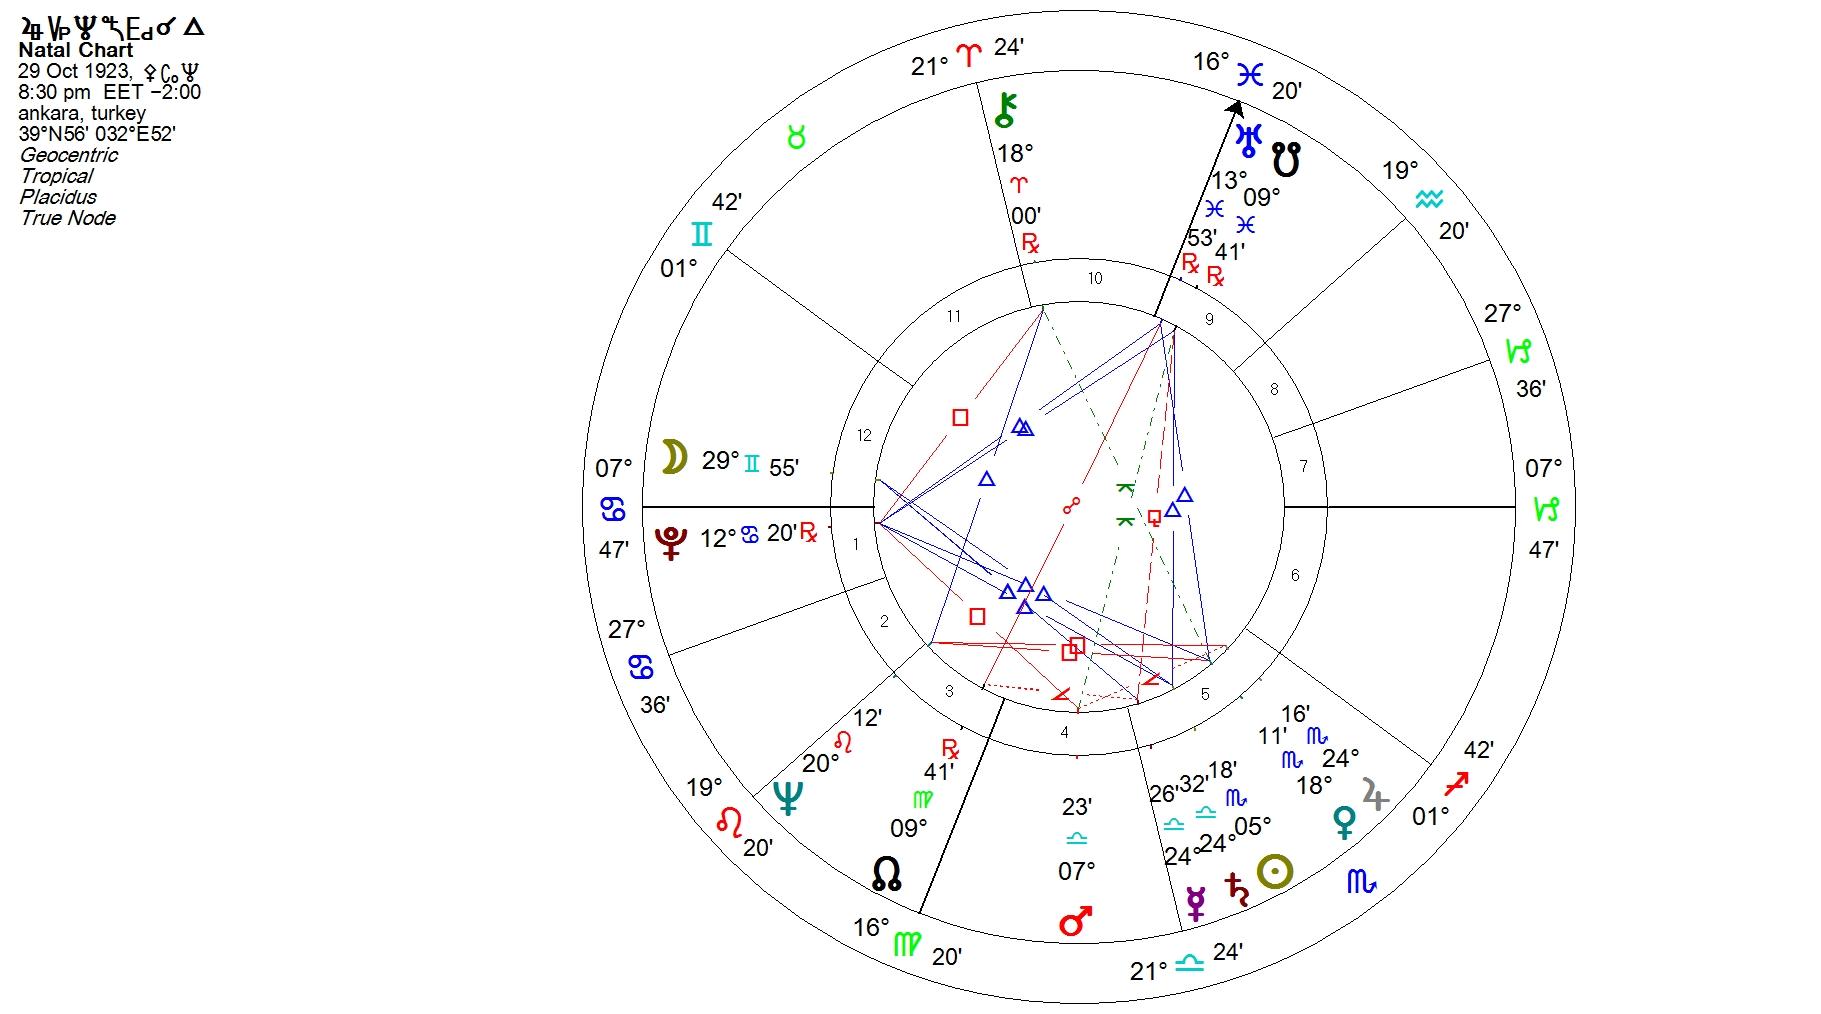 H Astrologikh Analysh Toy Gene8lioy Wroskopioy Ths Toyrkias Peri